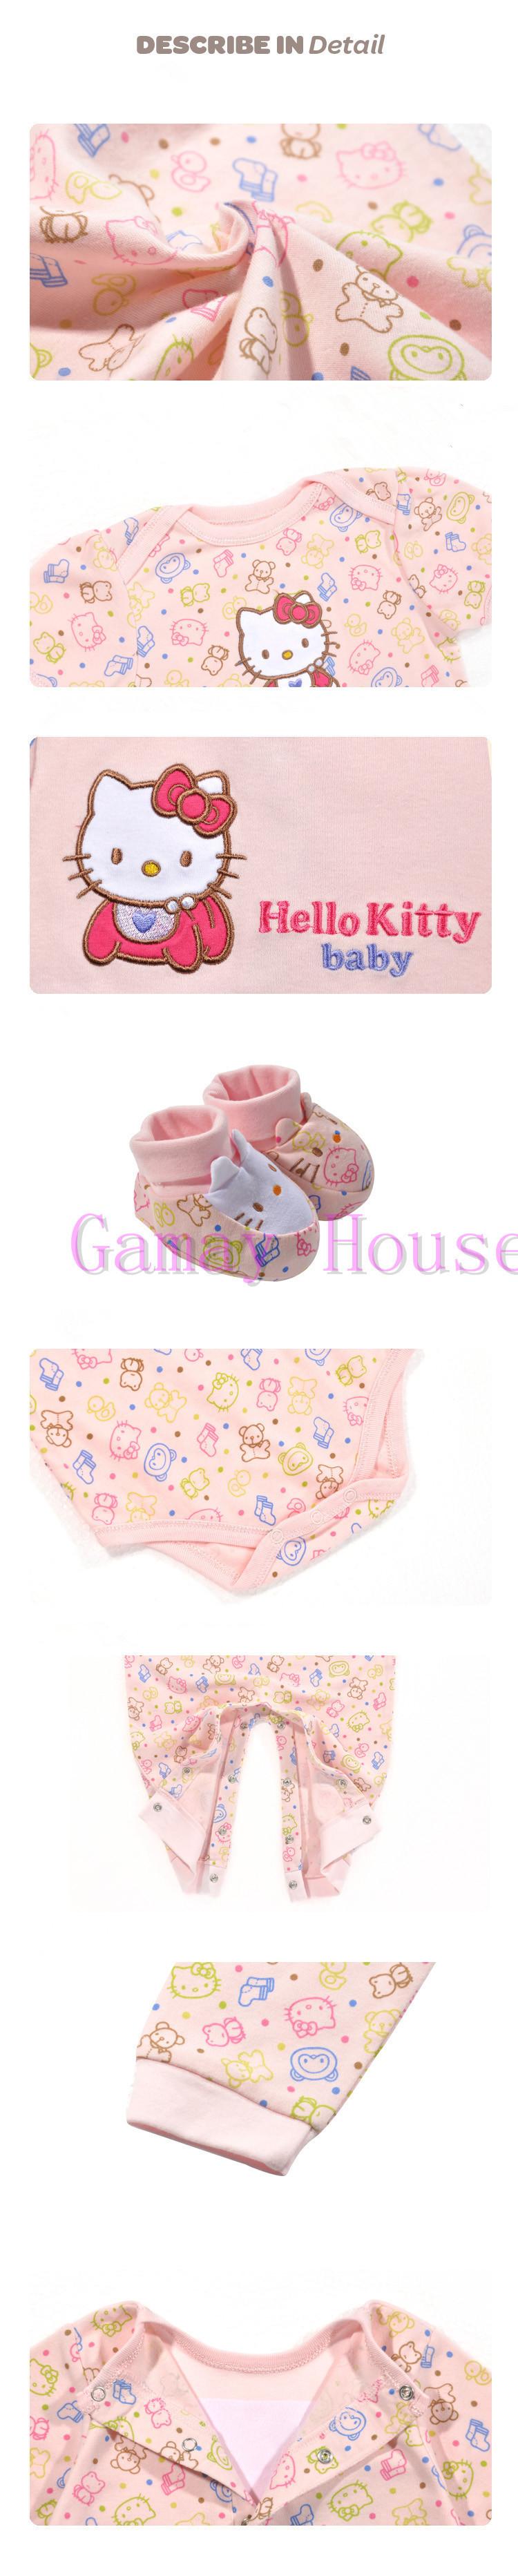 Комплект одежды для девочек G&H baby baby + + bebe 5 roupa frss GHR-002